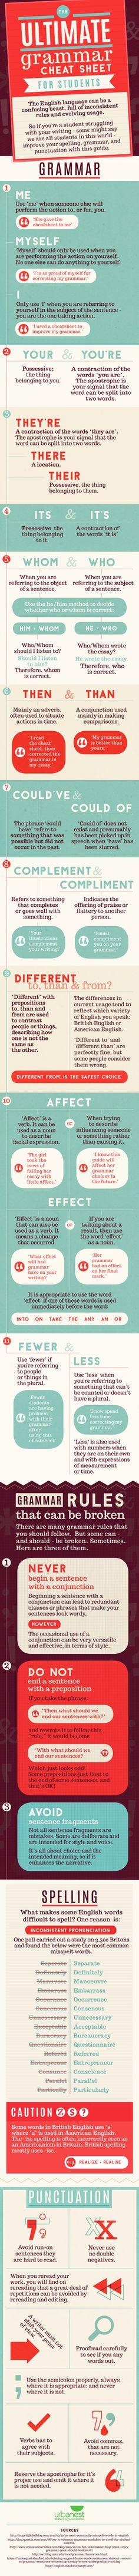 Infographic: The ultimate English grammar cheat sheet - Matador Network